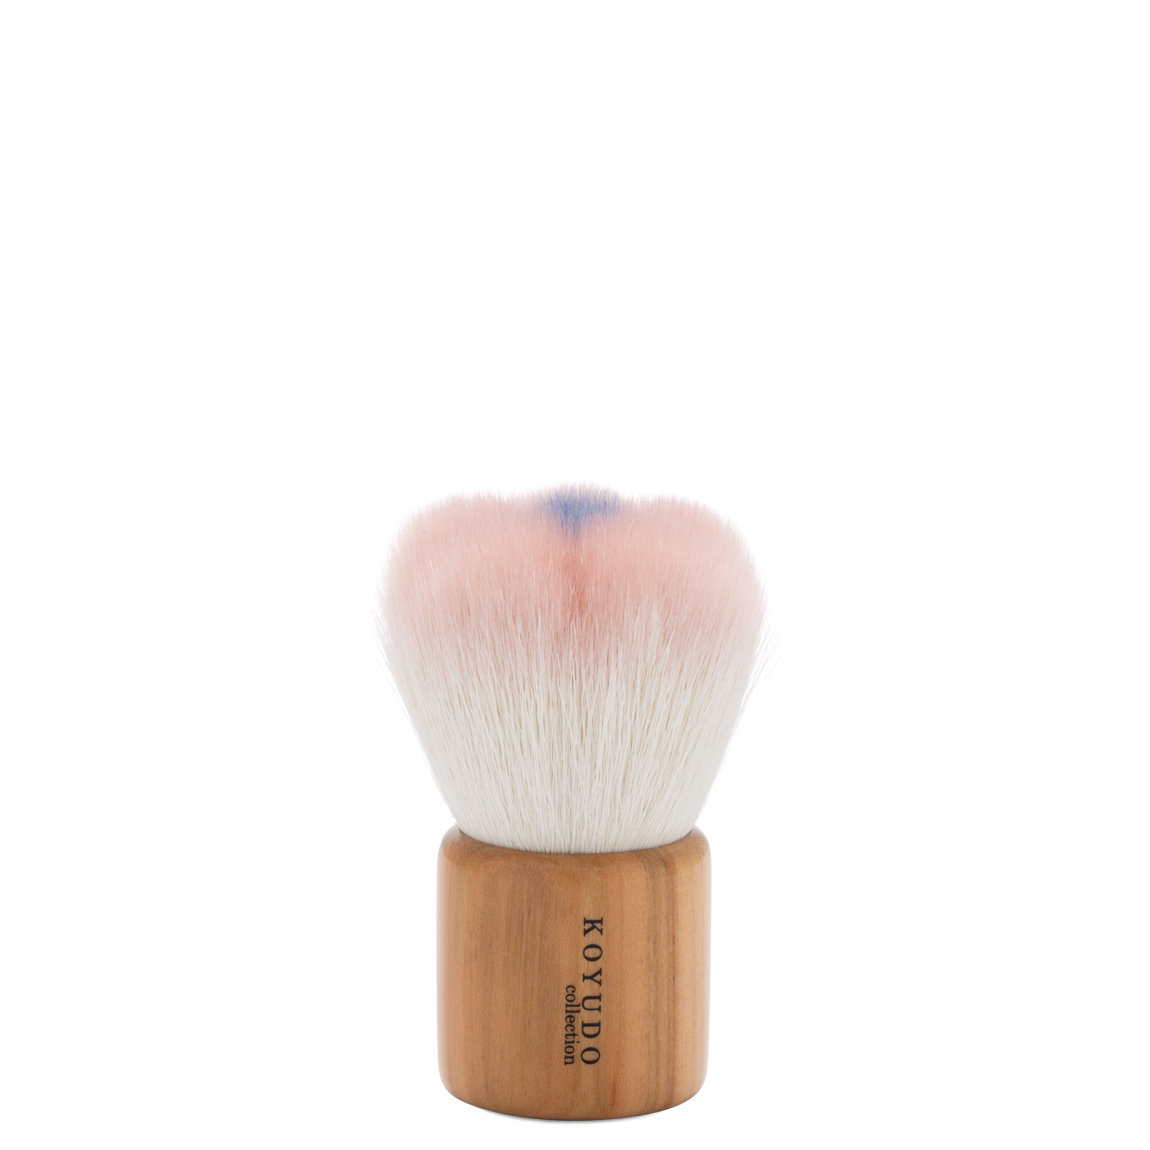 KOYUDO Innovative Series F001 Powder/Blush Brush - Pink product swatch.